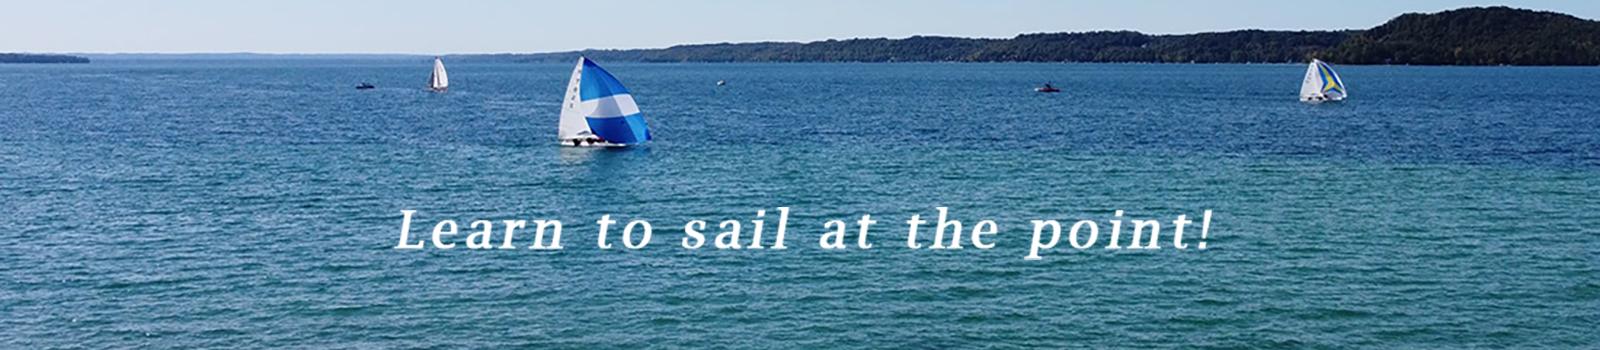 Torch Lake Sailing School